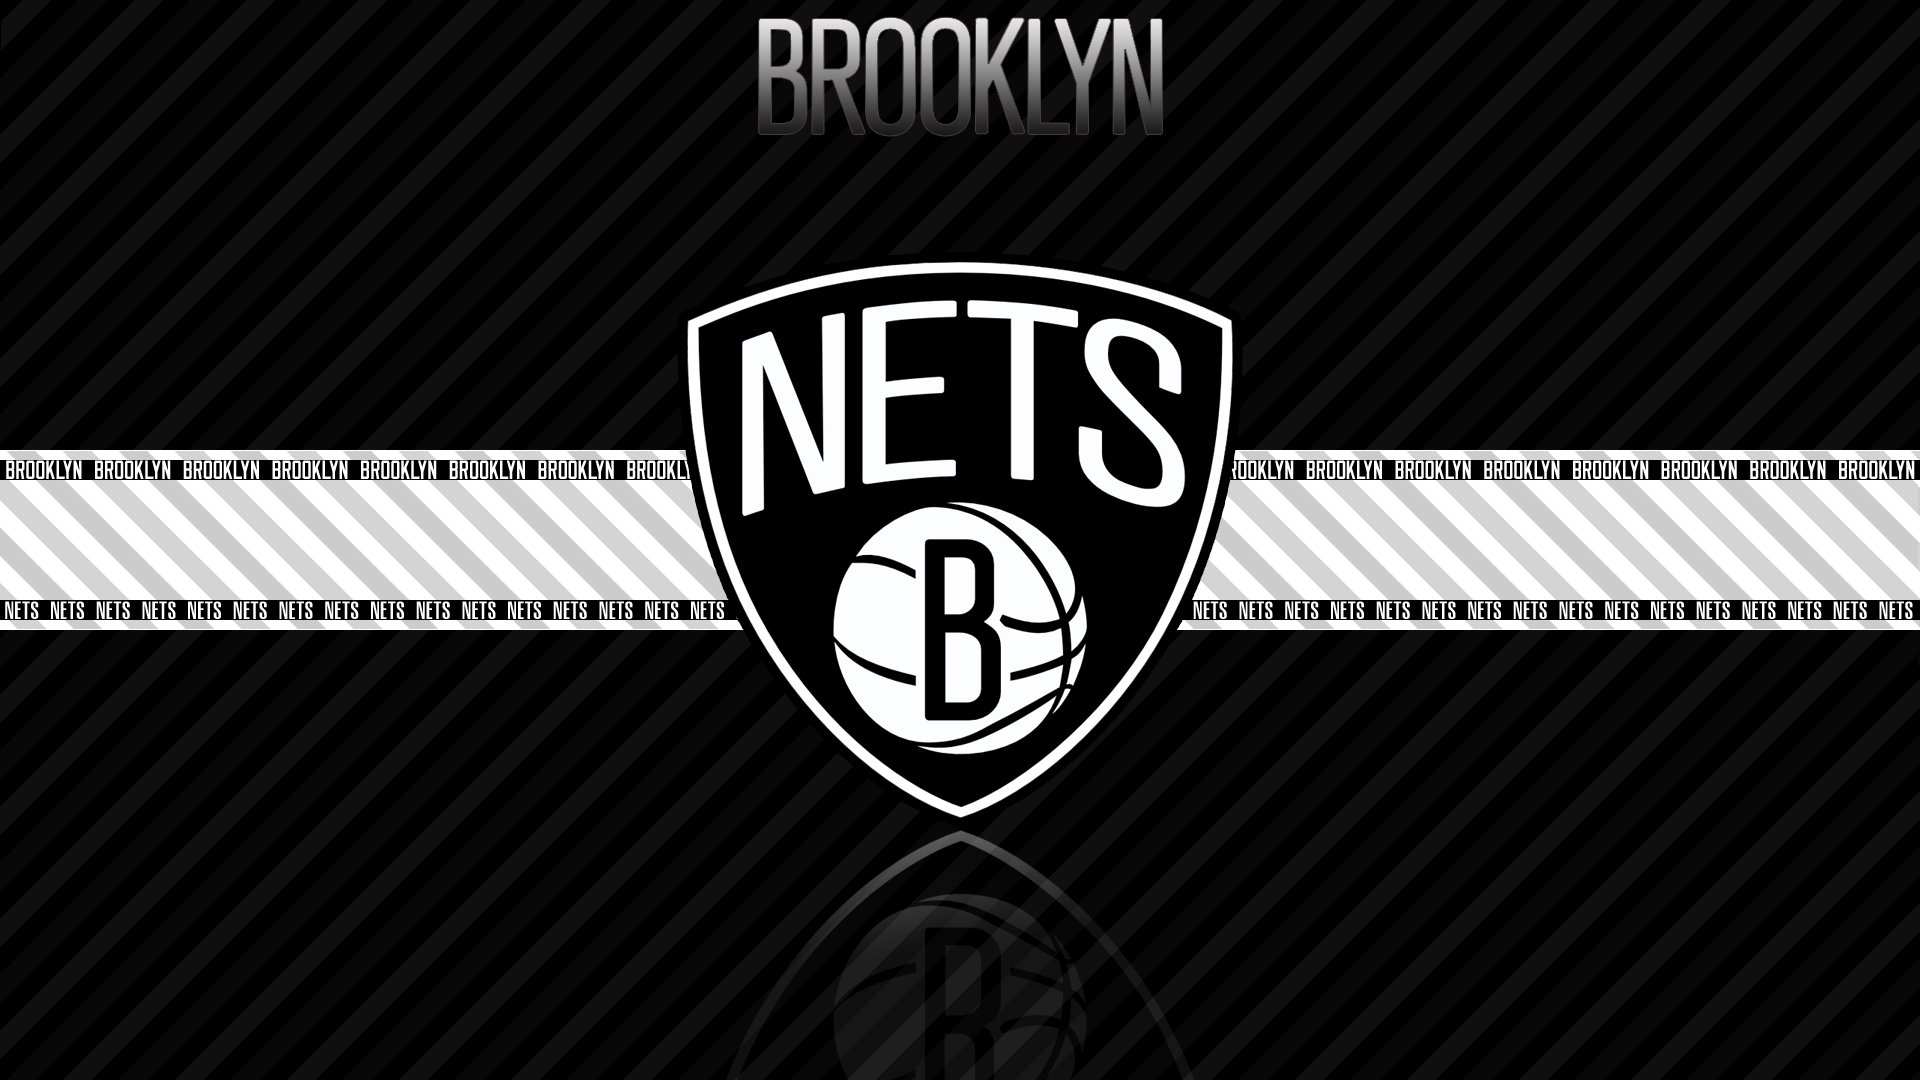 Brooklyn Nets Hd Wallpaper Background Image 1920x1080